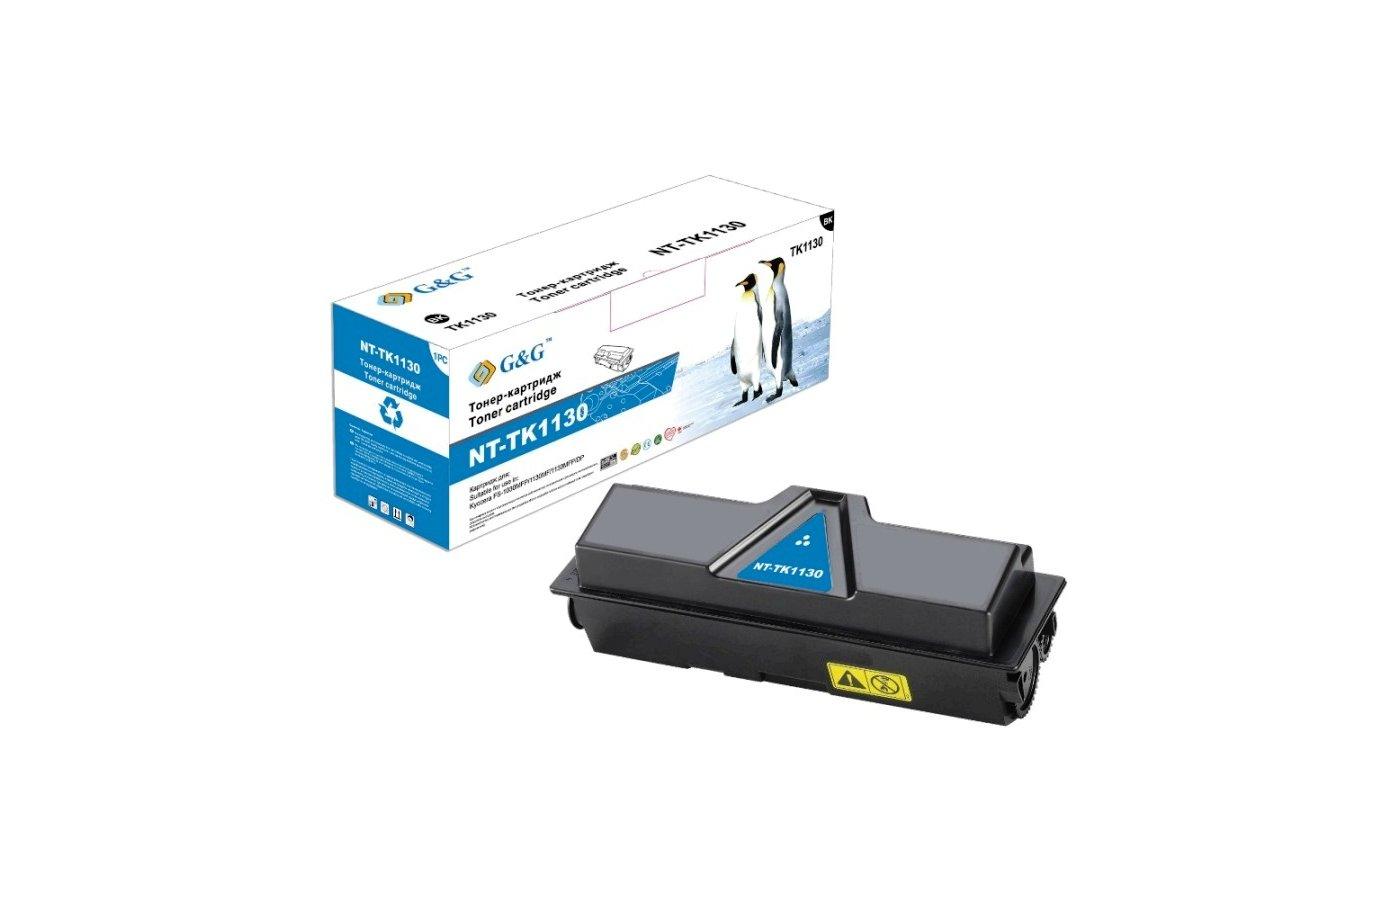 Картридж лазерный GG NT-TK1130 Совместимый для Kyocera 1030MFP/1130MFP (3000стр)